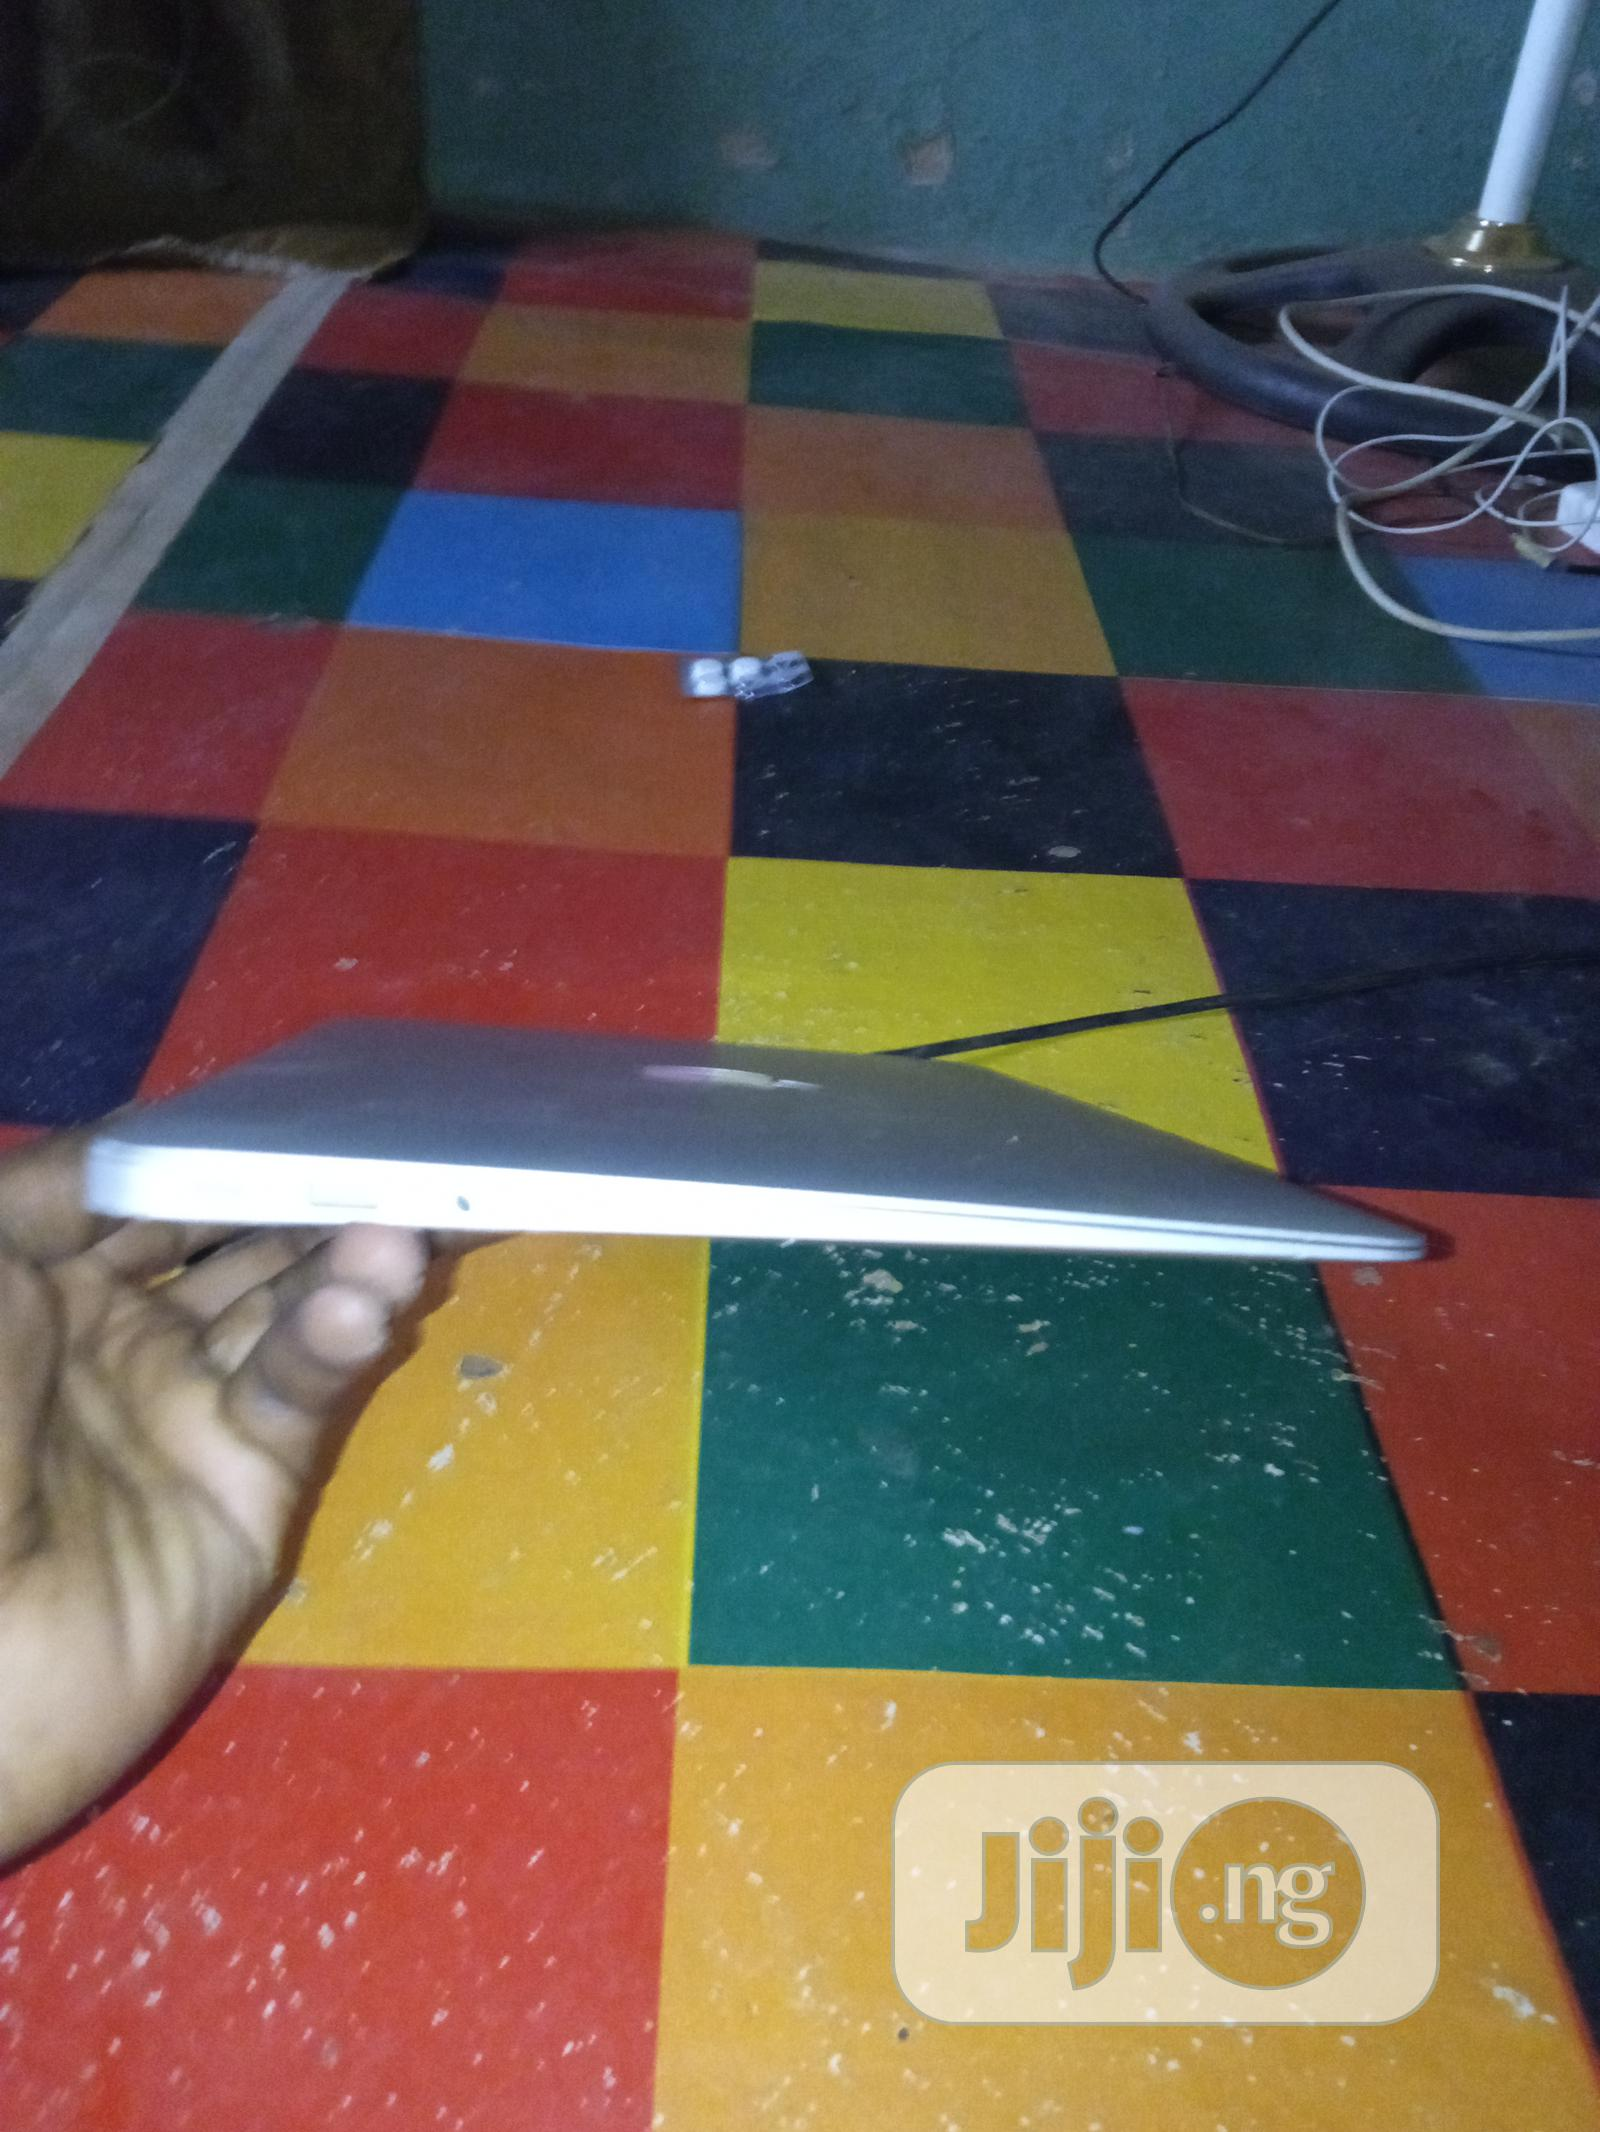 Archive: Laptop Apple MacBook Air 4GB Intel Core I5 HDD 320GB